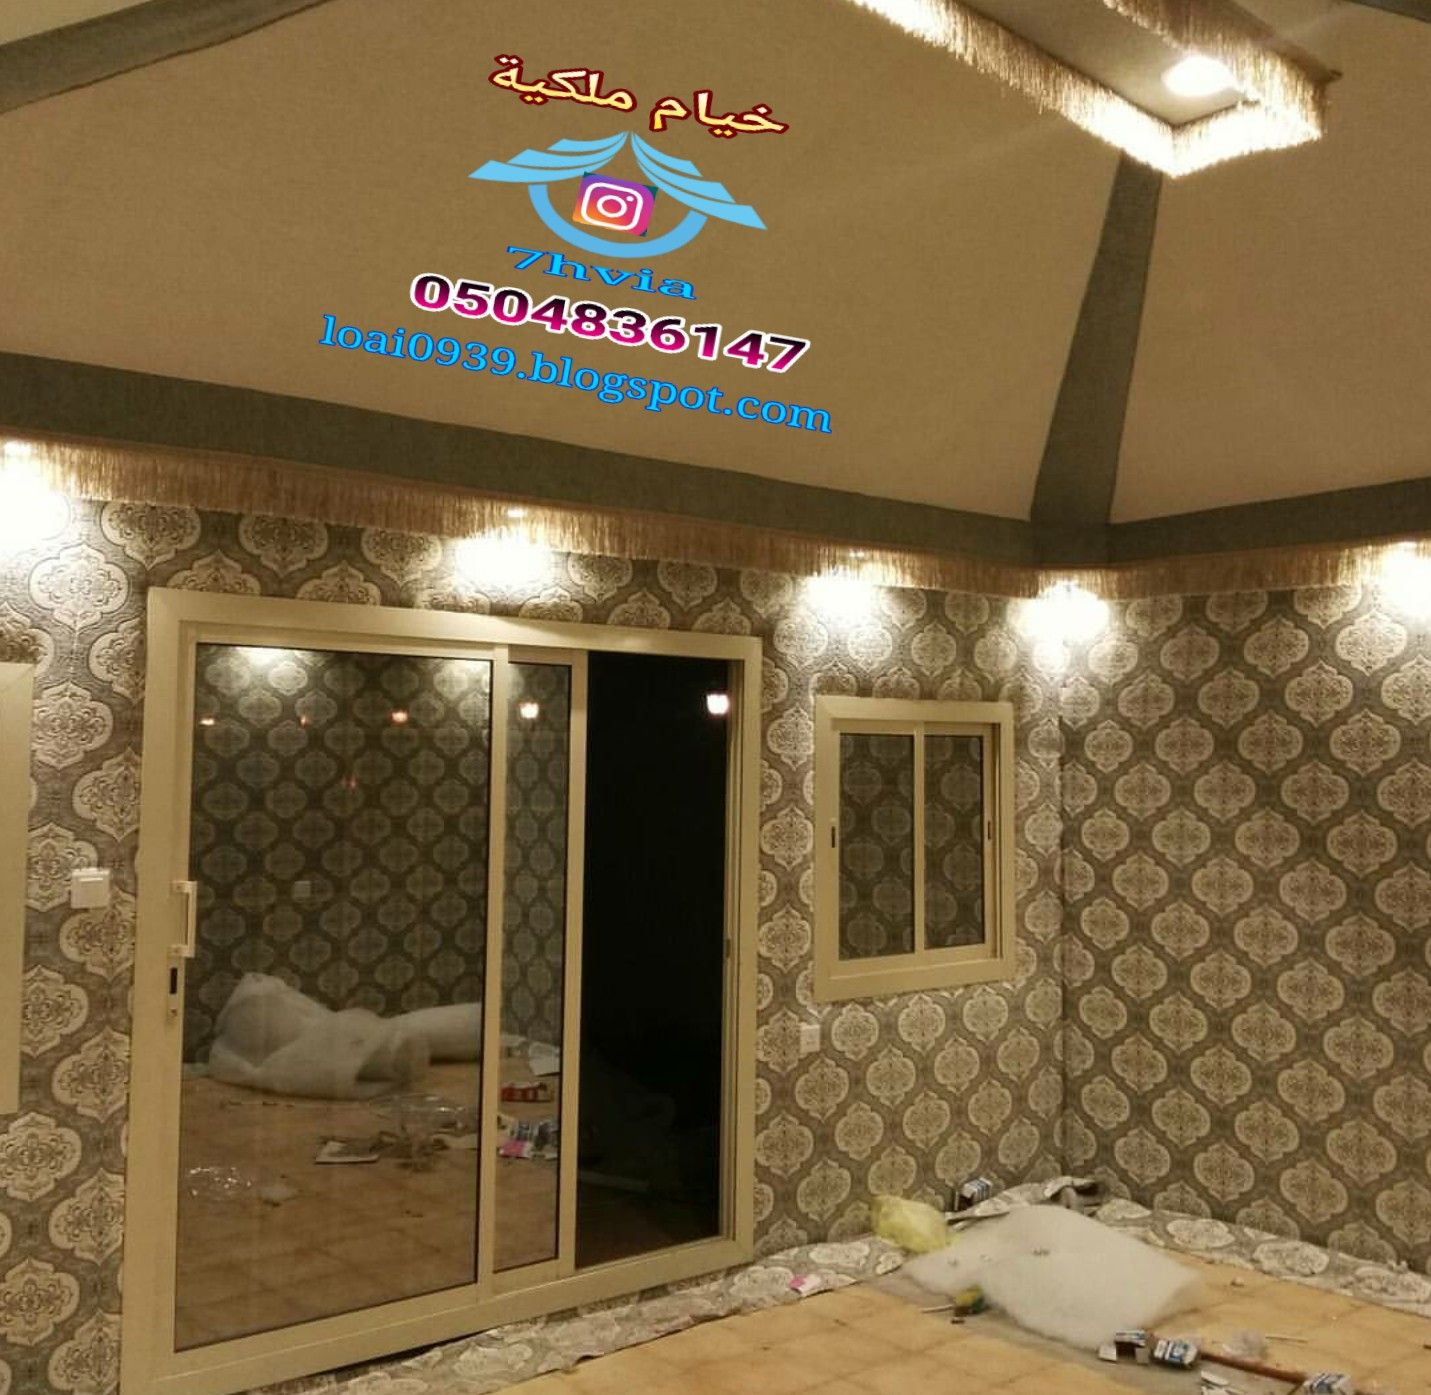 خيام ملكية خيام بيوت الشعر خيمة Home Furniture Home Decor